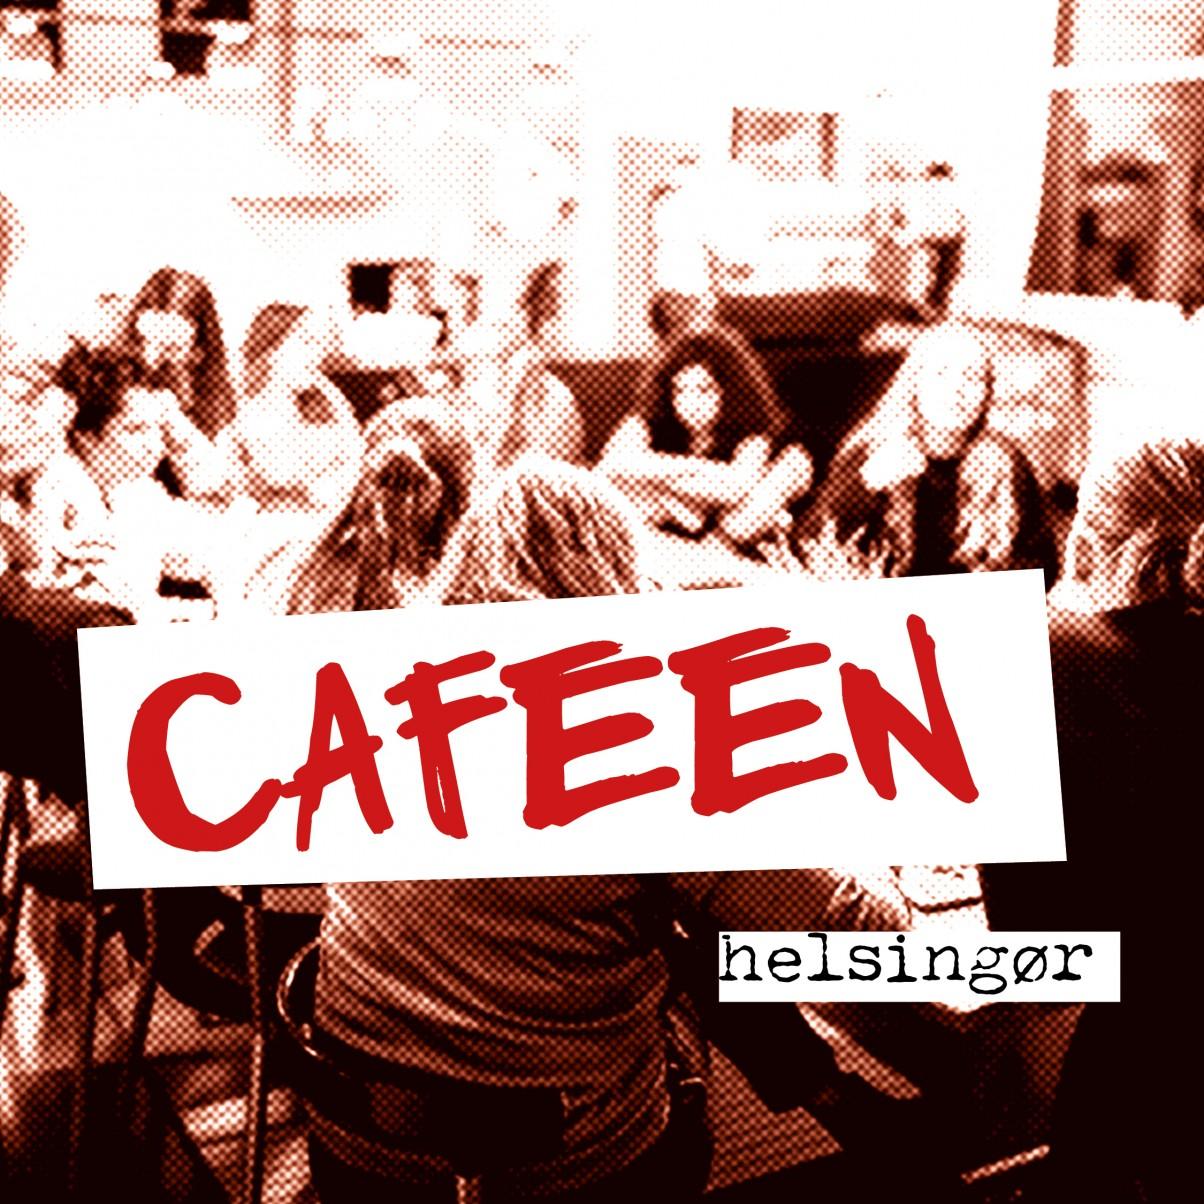 Dekoration_Cafeen_Helsingor